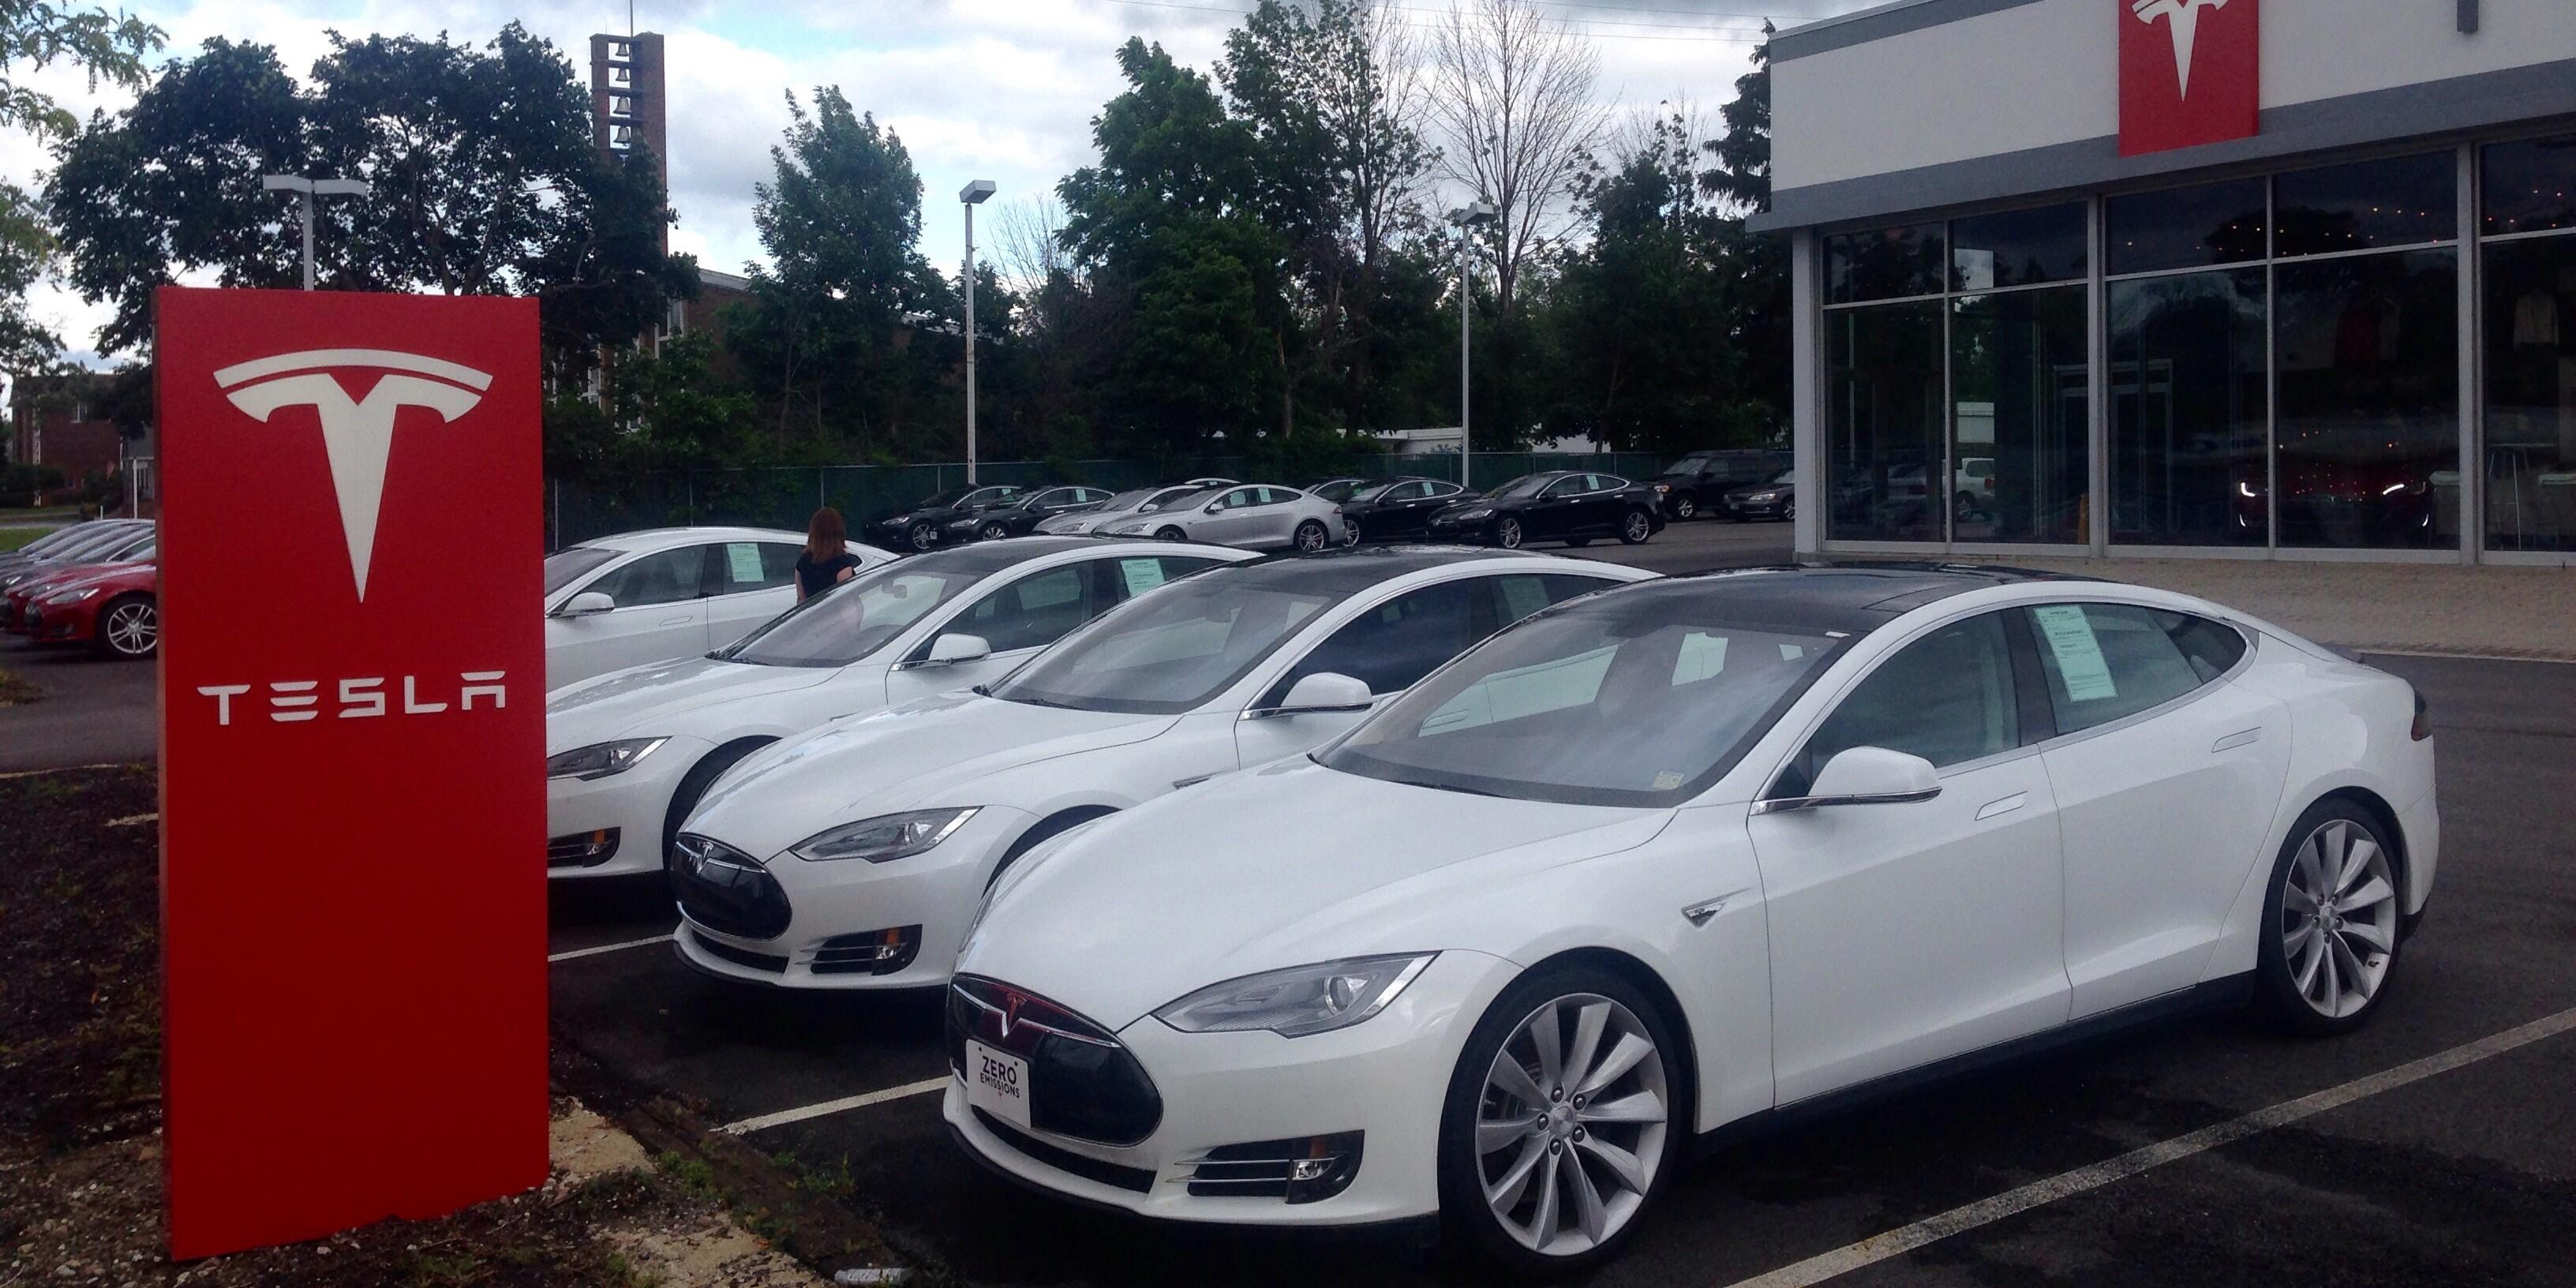 jon_Tesla_cleaveland_pic